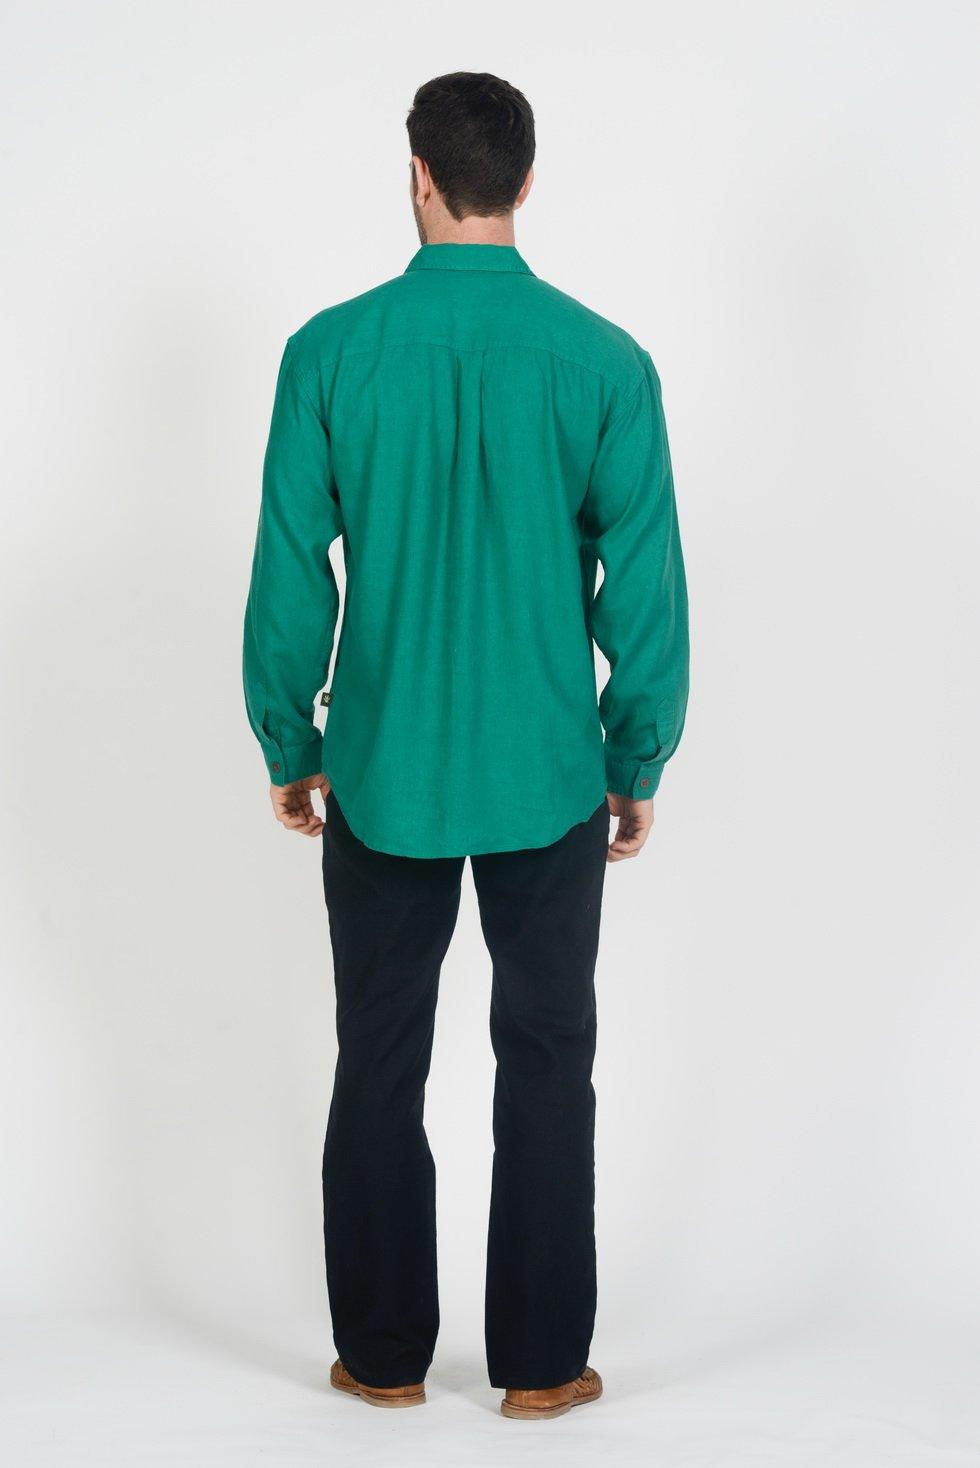 Mens Hemp Rayon Relax Fit Long Sleeve Shirt-Chive